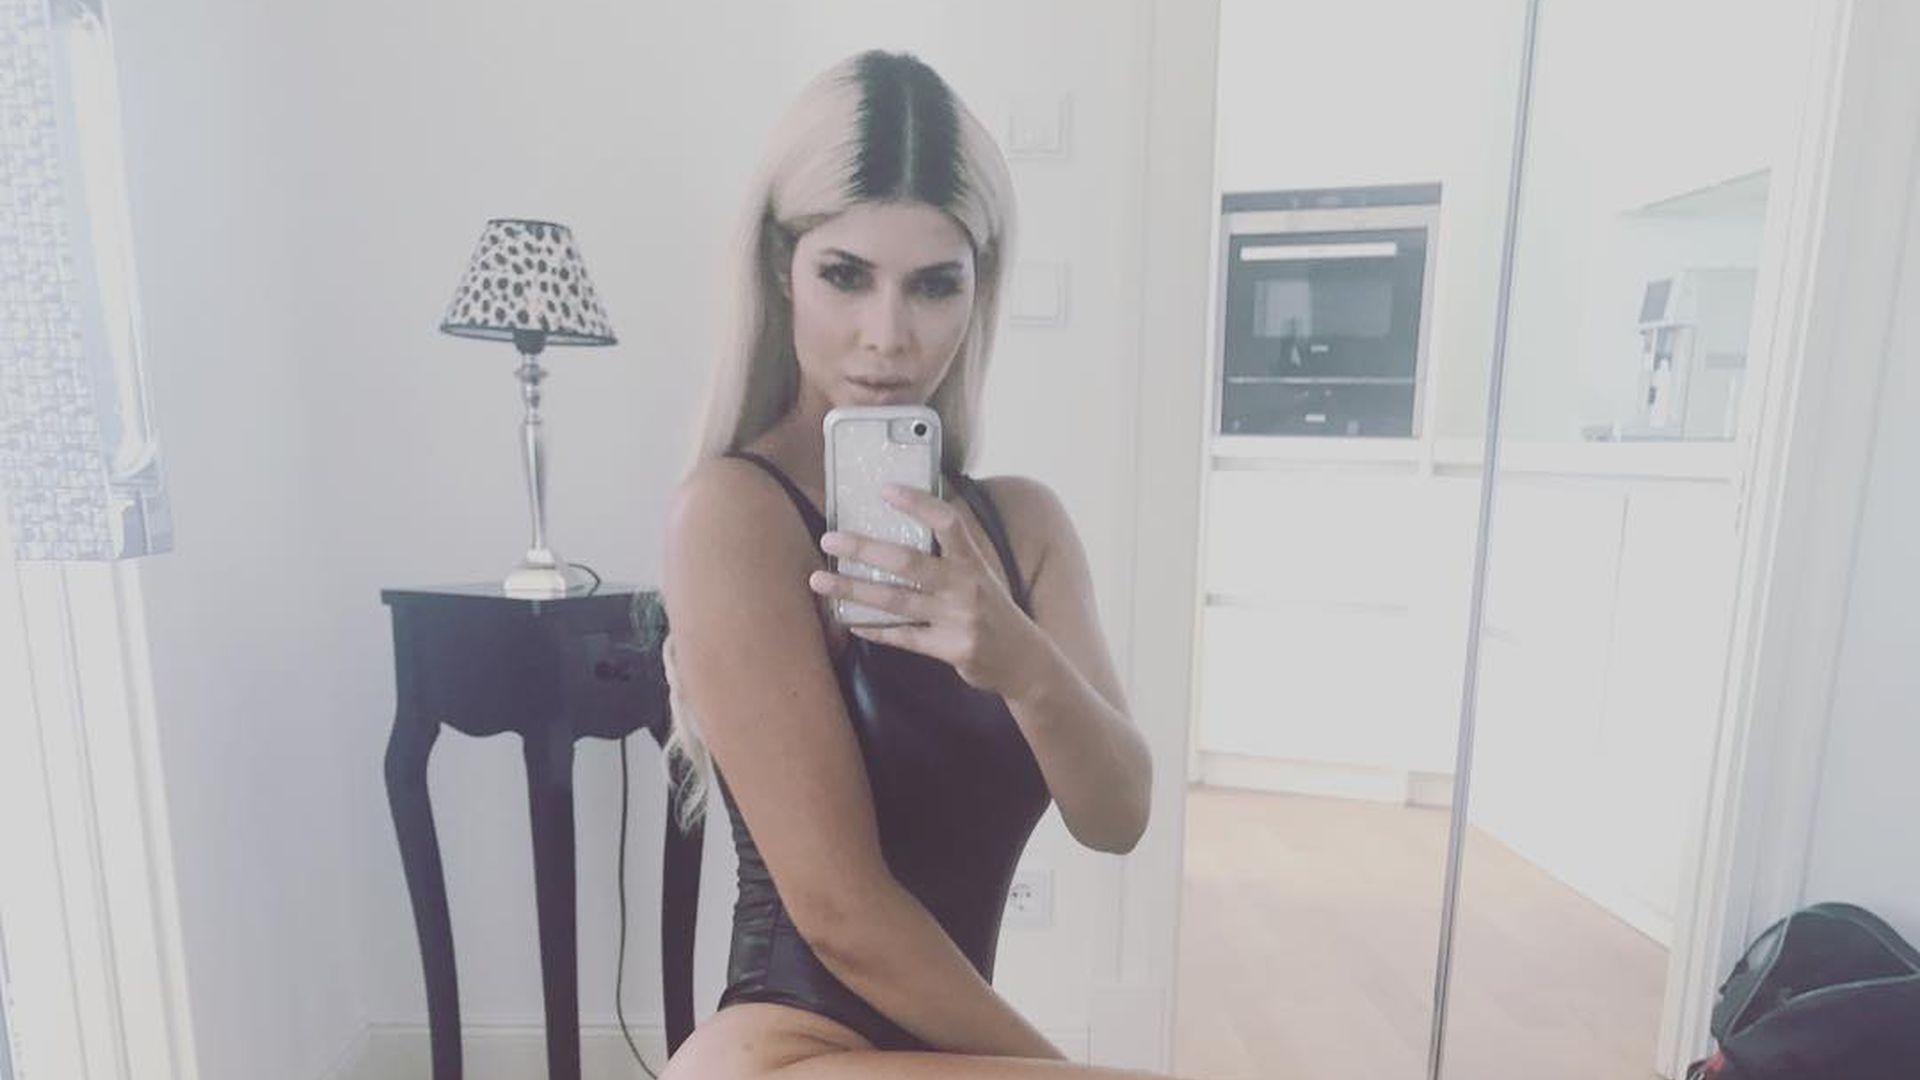 Instagram Micaela-Schafer nude photos 2019